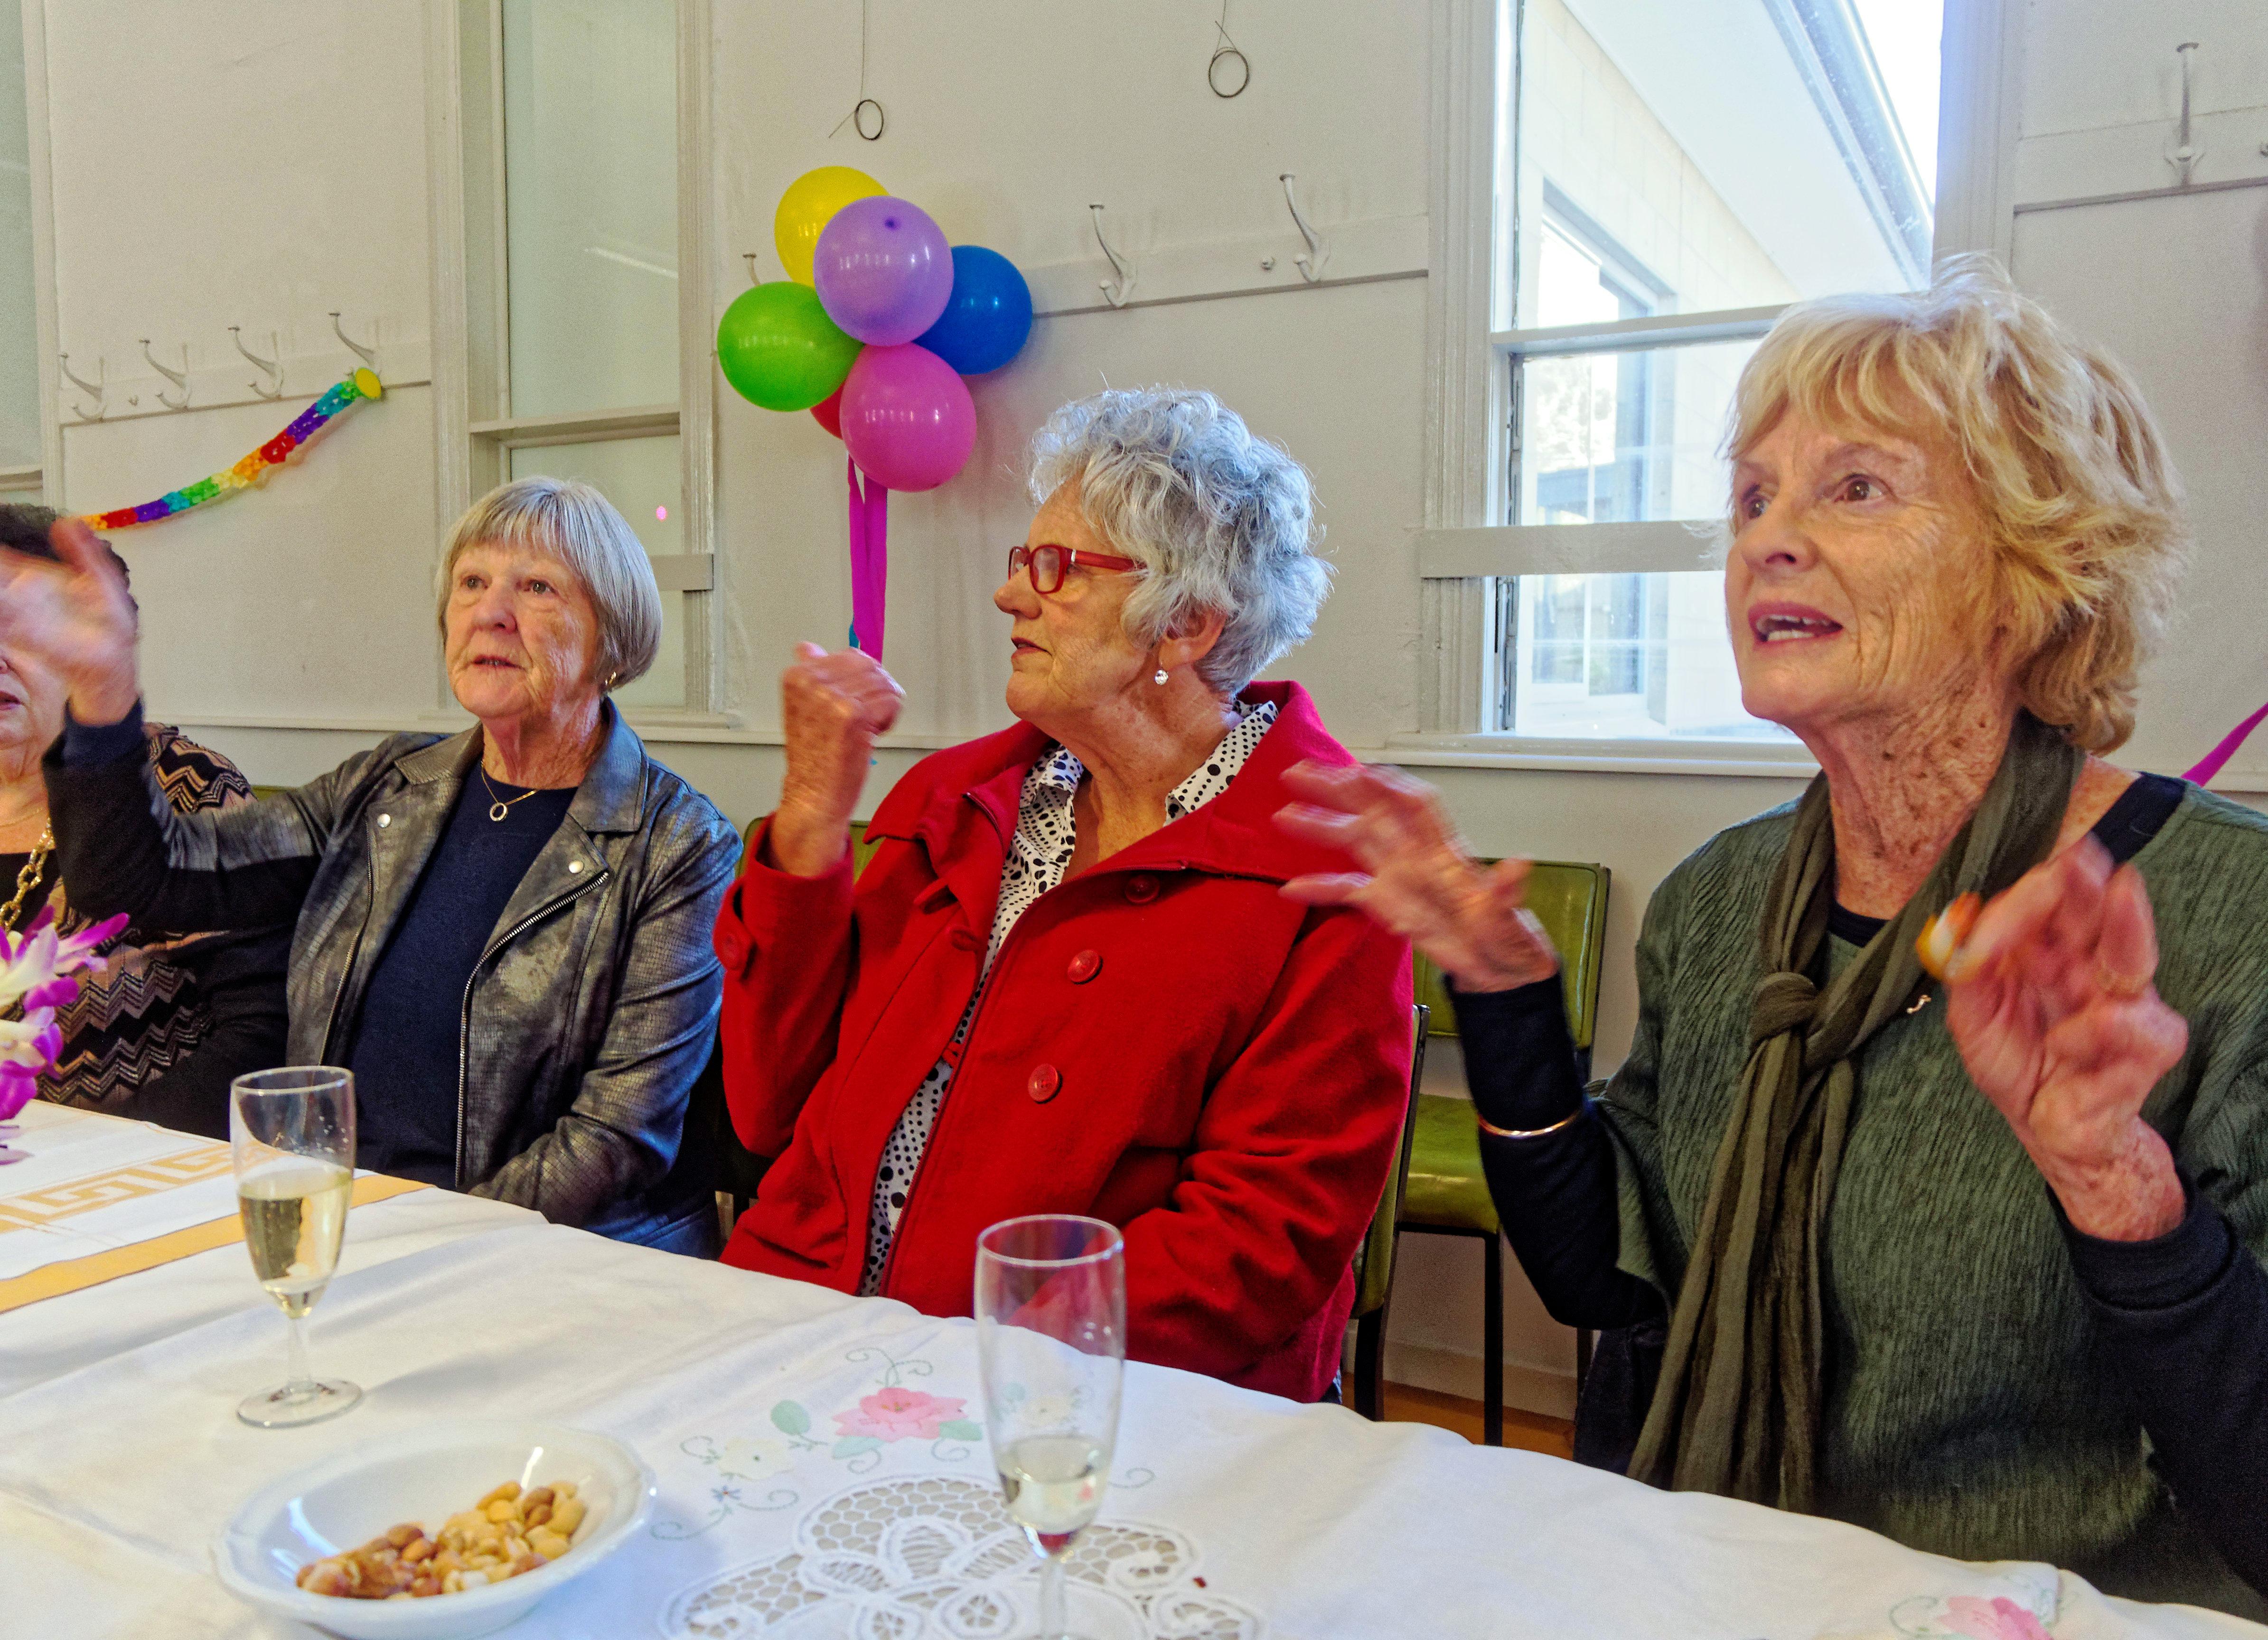 70th-birthday-party-10.jpeg